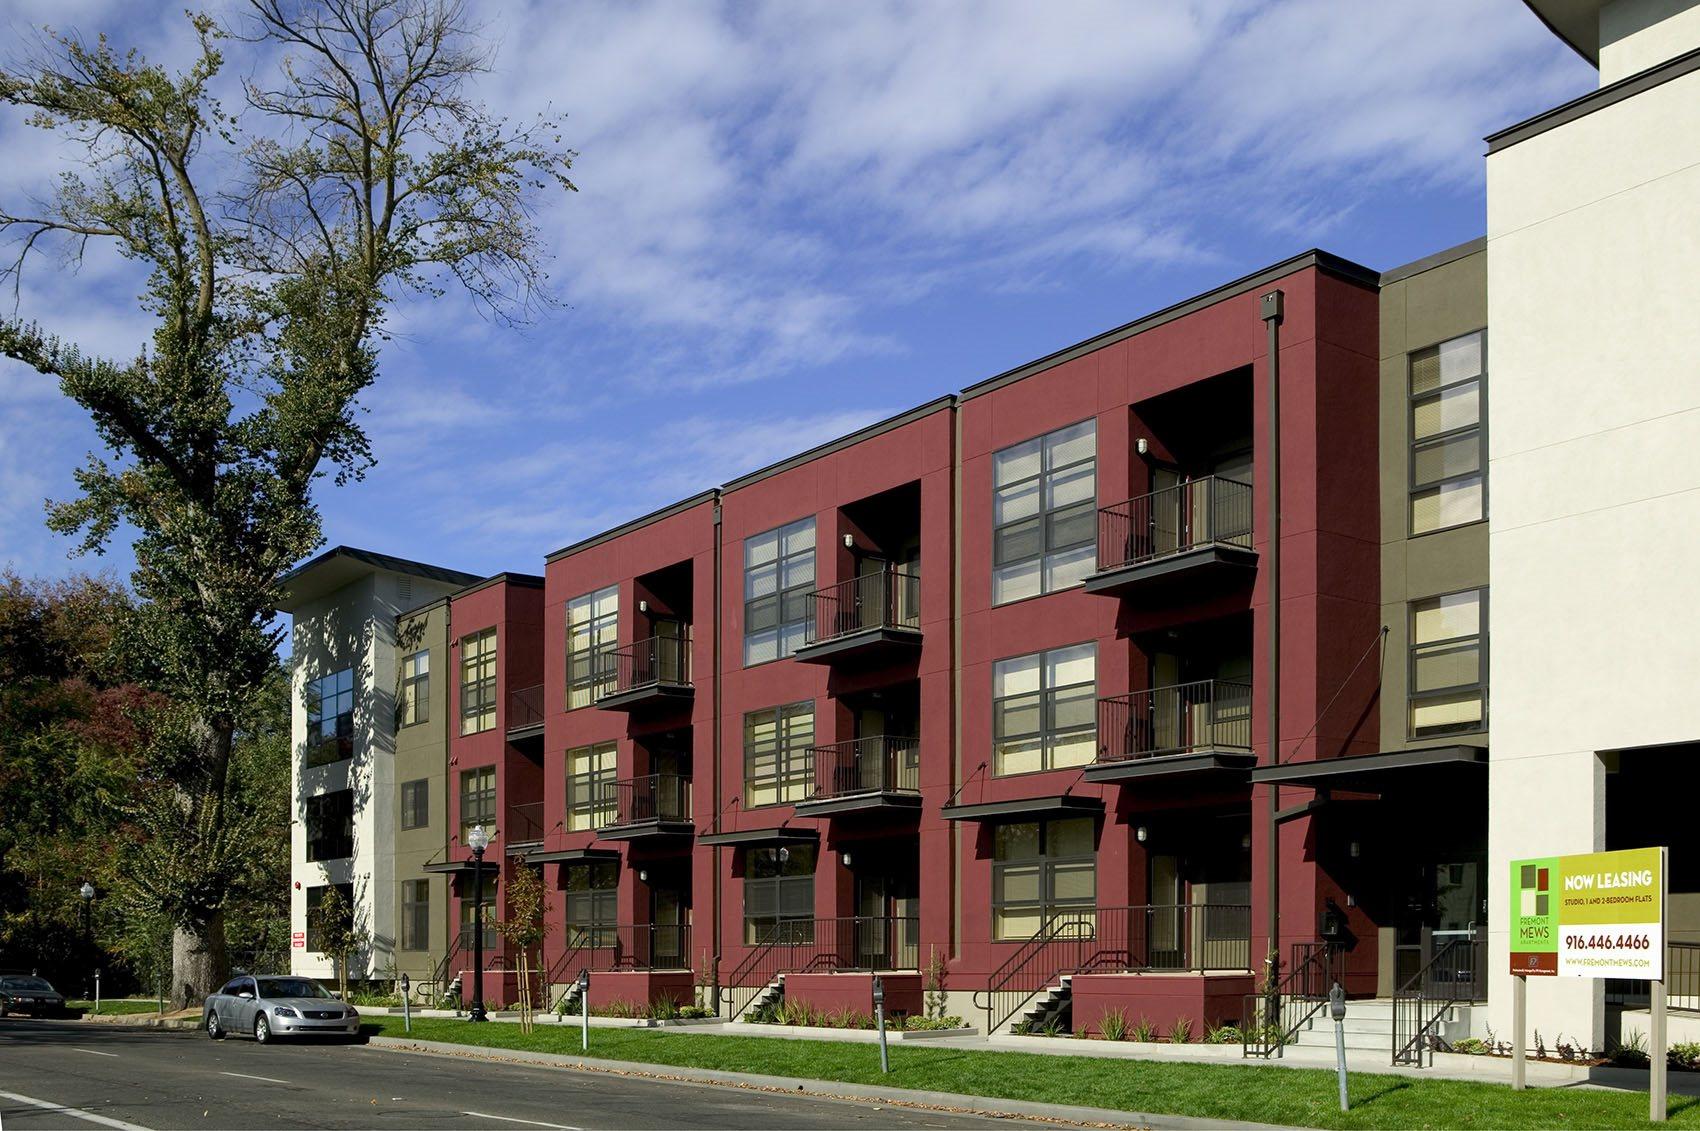 Craigslist Sacramento Apartment Housing